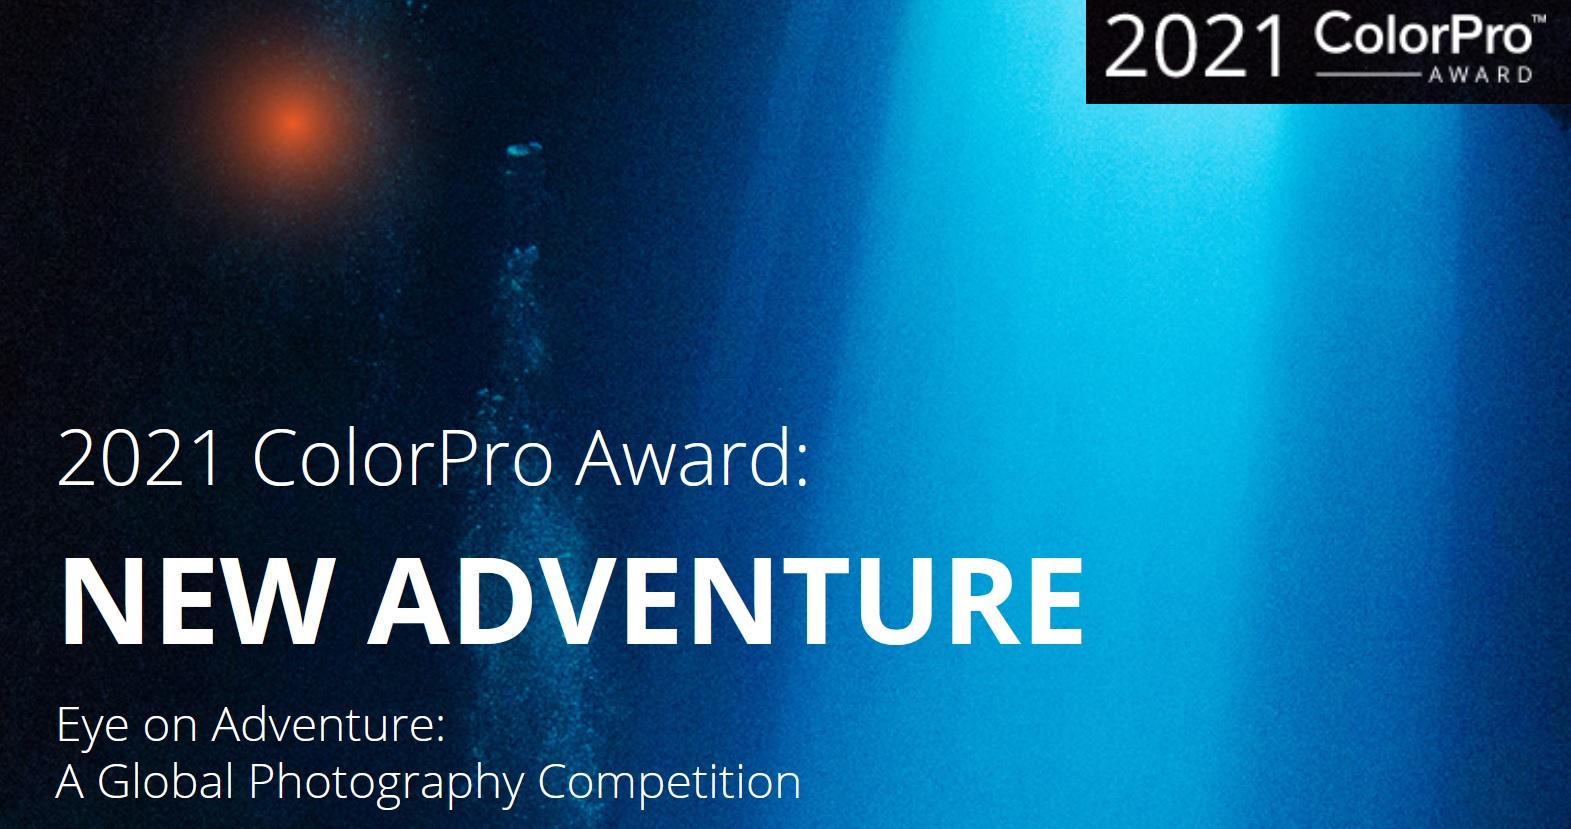 ColorPro Award 2021 - logo